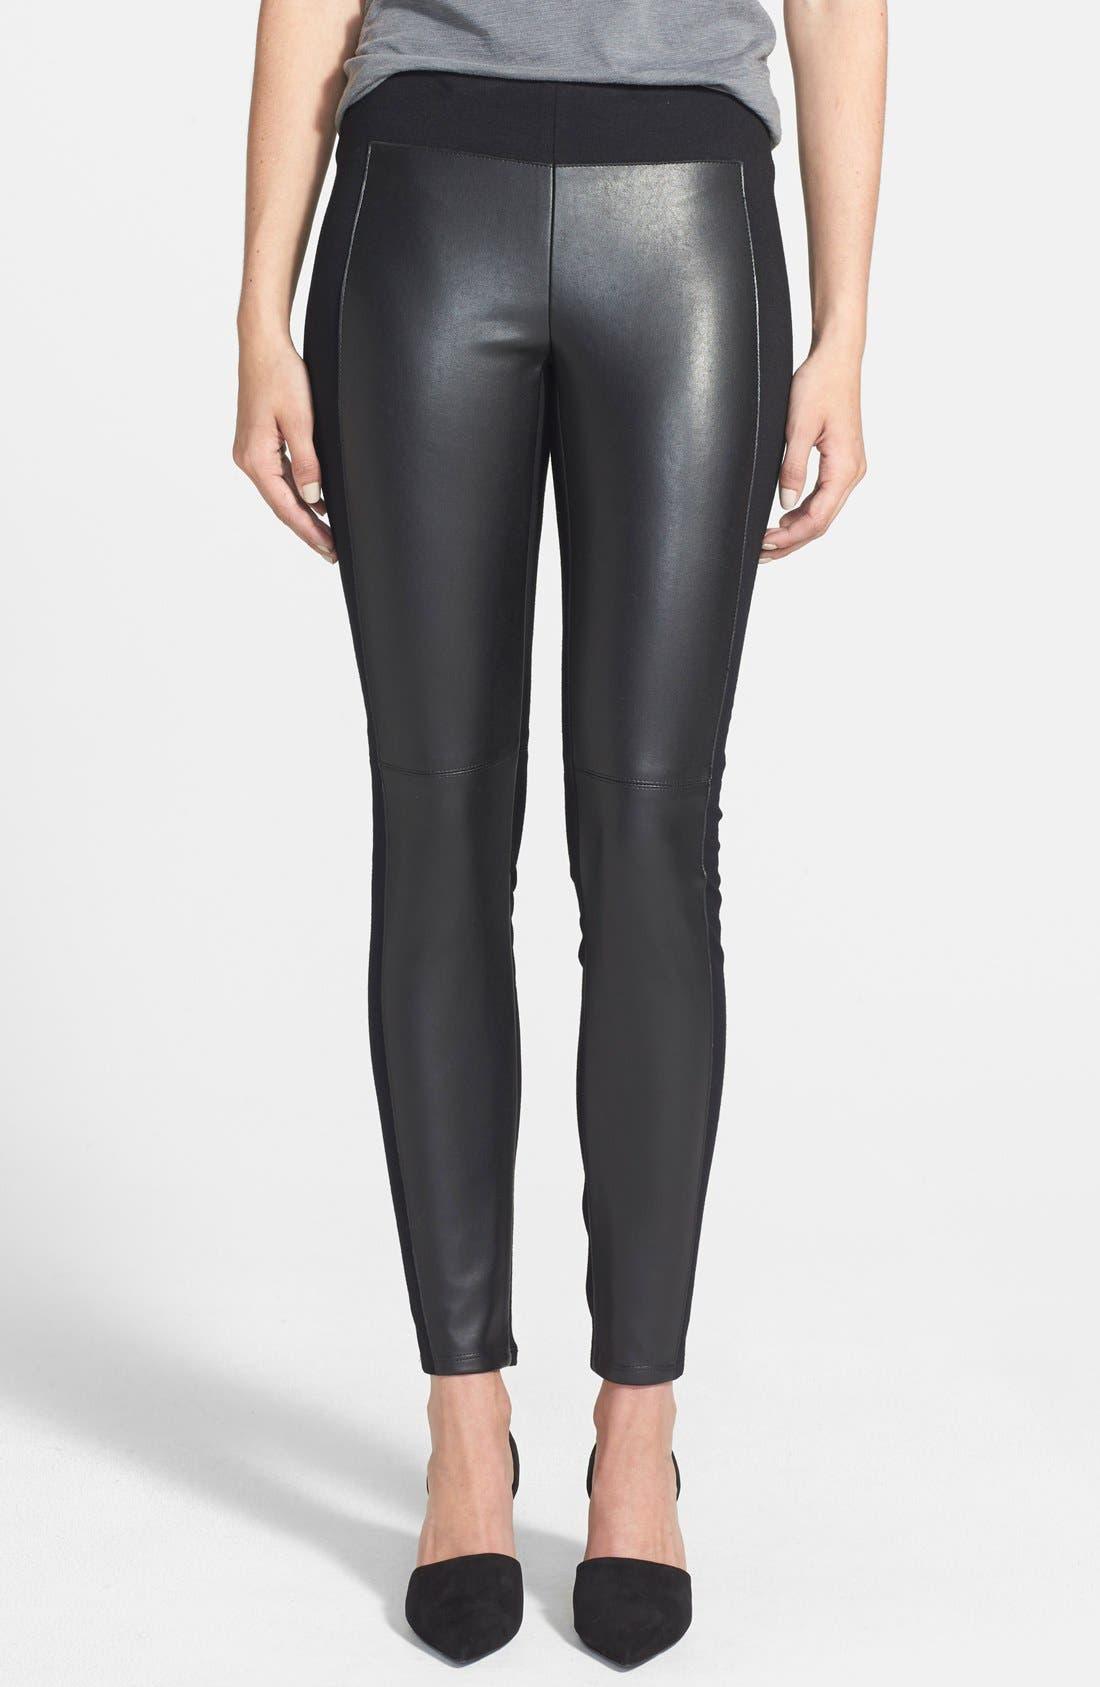 'Ski Pole' Faux Leather & Ponte Pants,                             Main thumbnail 1, color,                             001